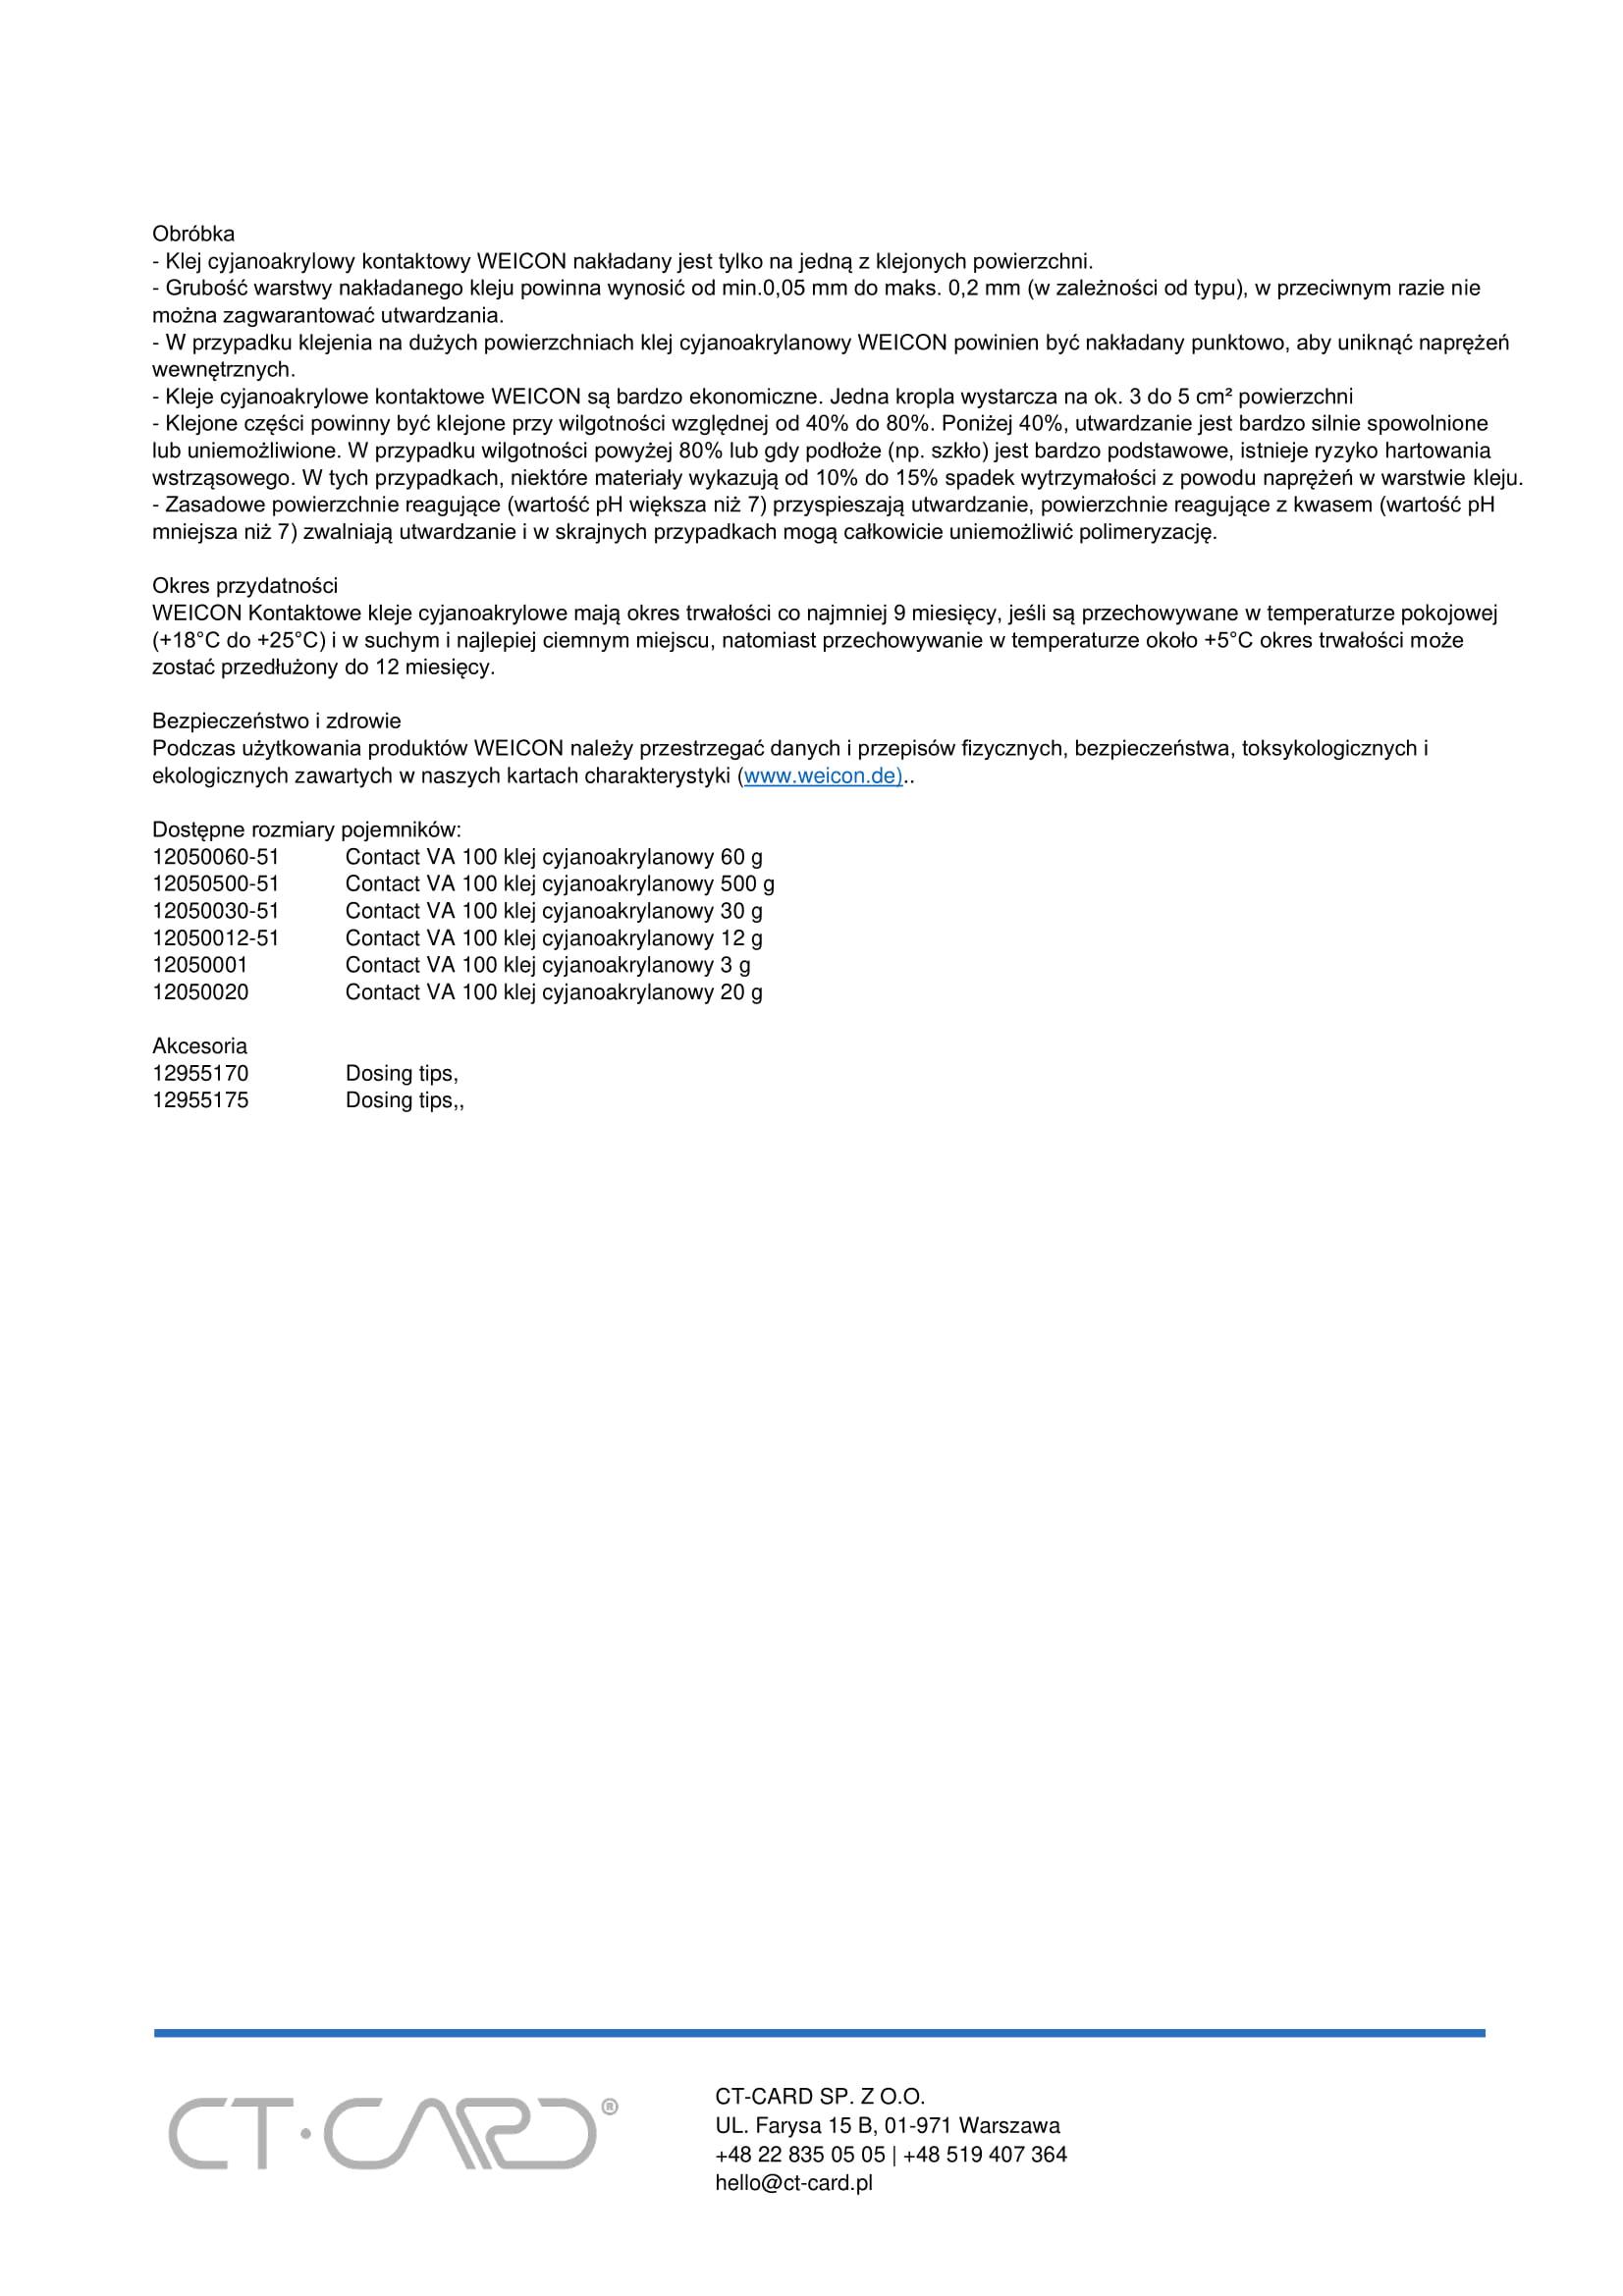 Contact VA 100 klej cyjanoakrylanowy-2